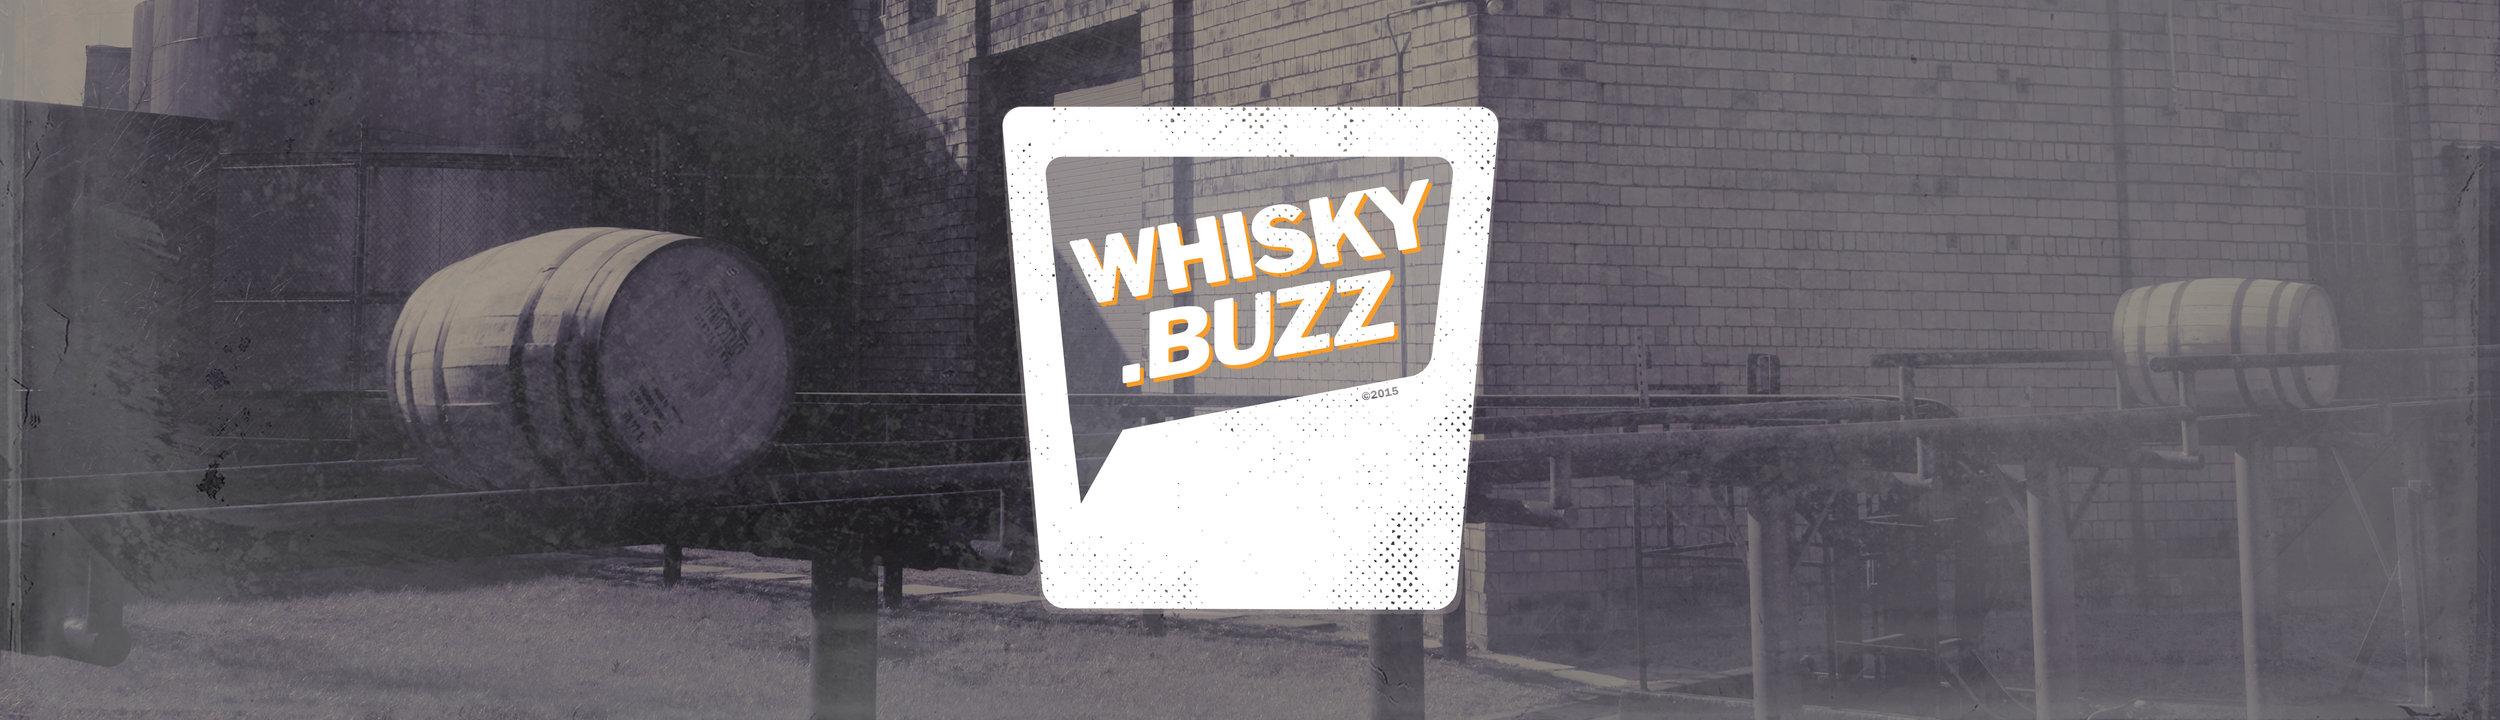 whskybuzz_websiteImage_LG.jpg